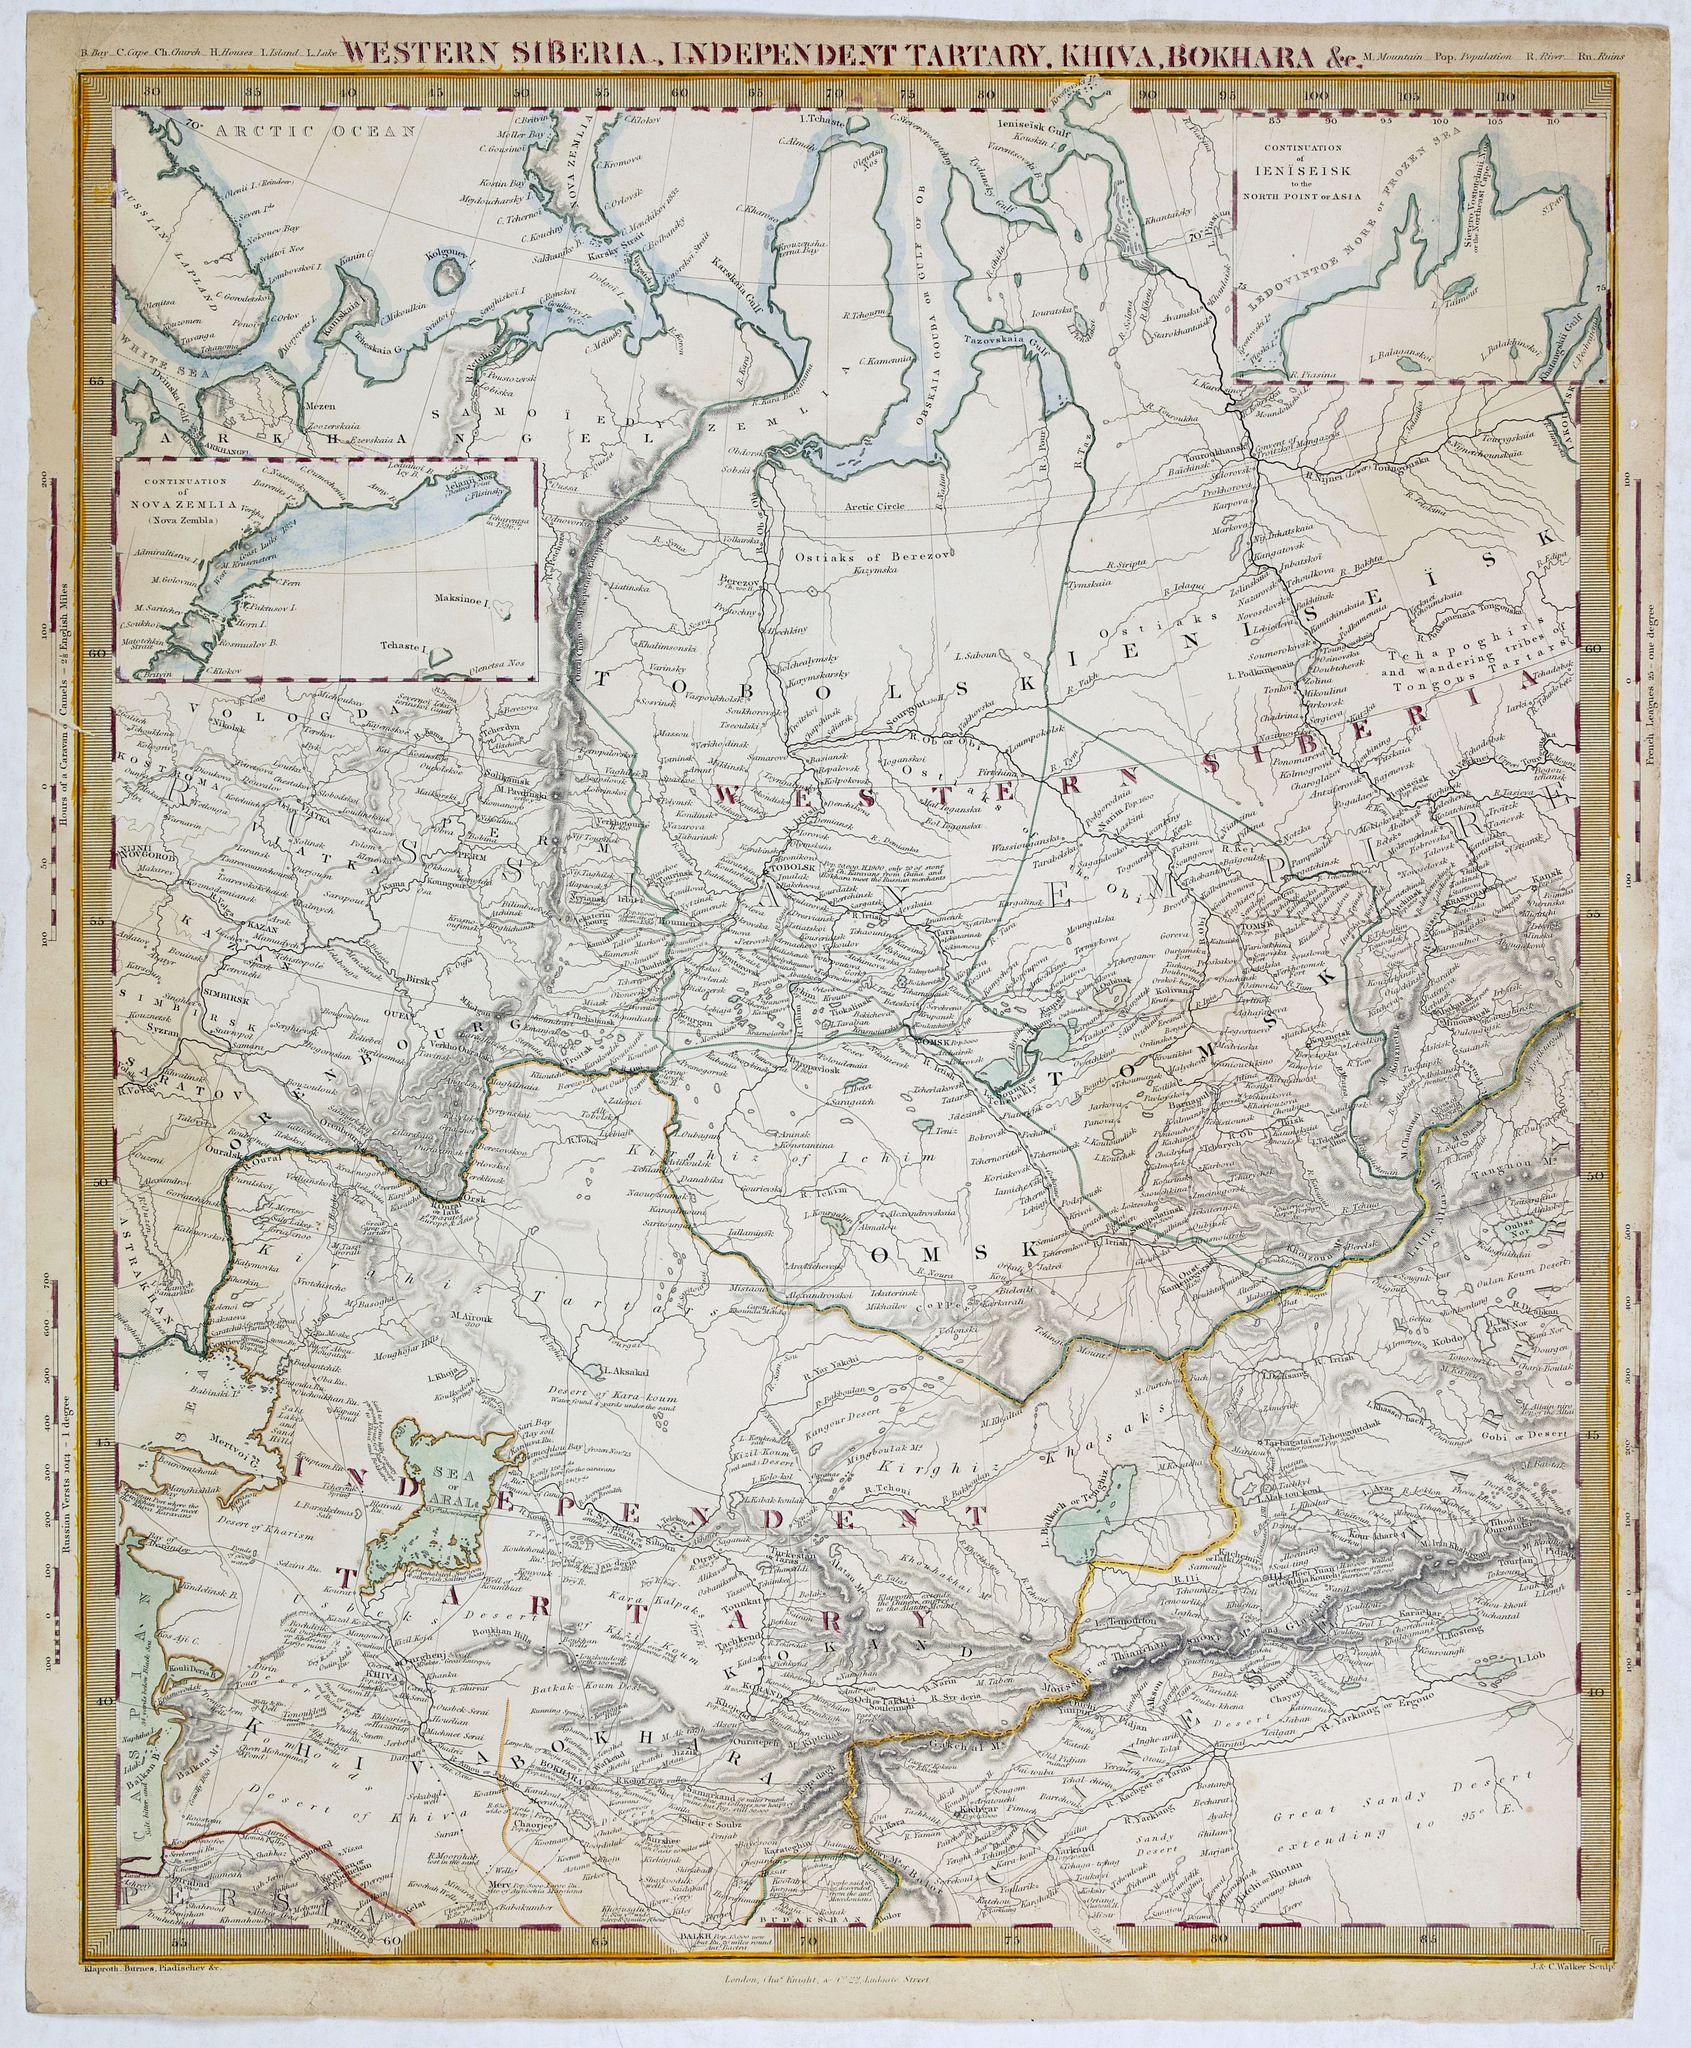 WALKER, J & C. -  Western siberia, independent tartary, khiva, bokhara…..